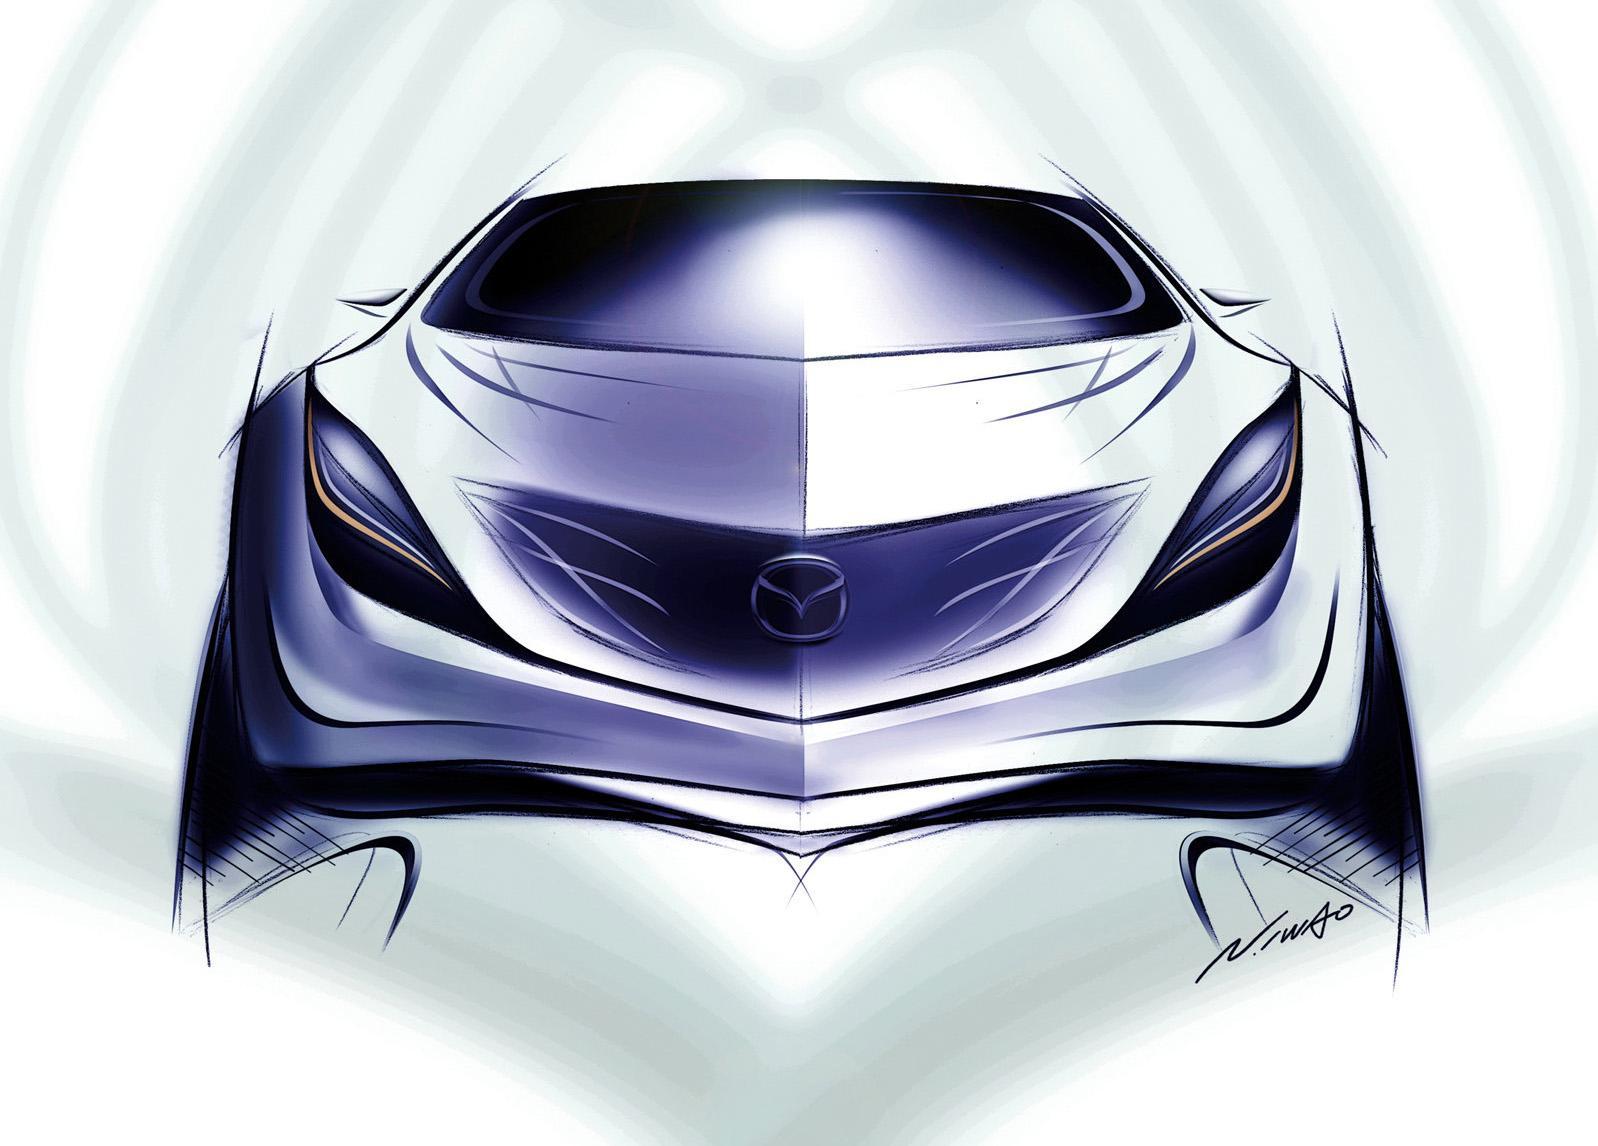 https://www.conceptcarz.com/images/Mazda/Mazda-Kazamai_Concept_2008_8.jpg